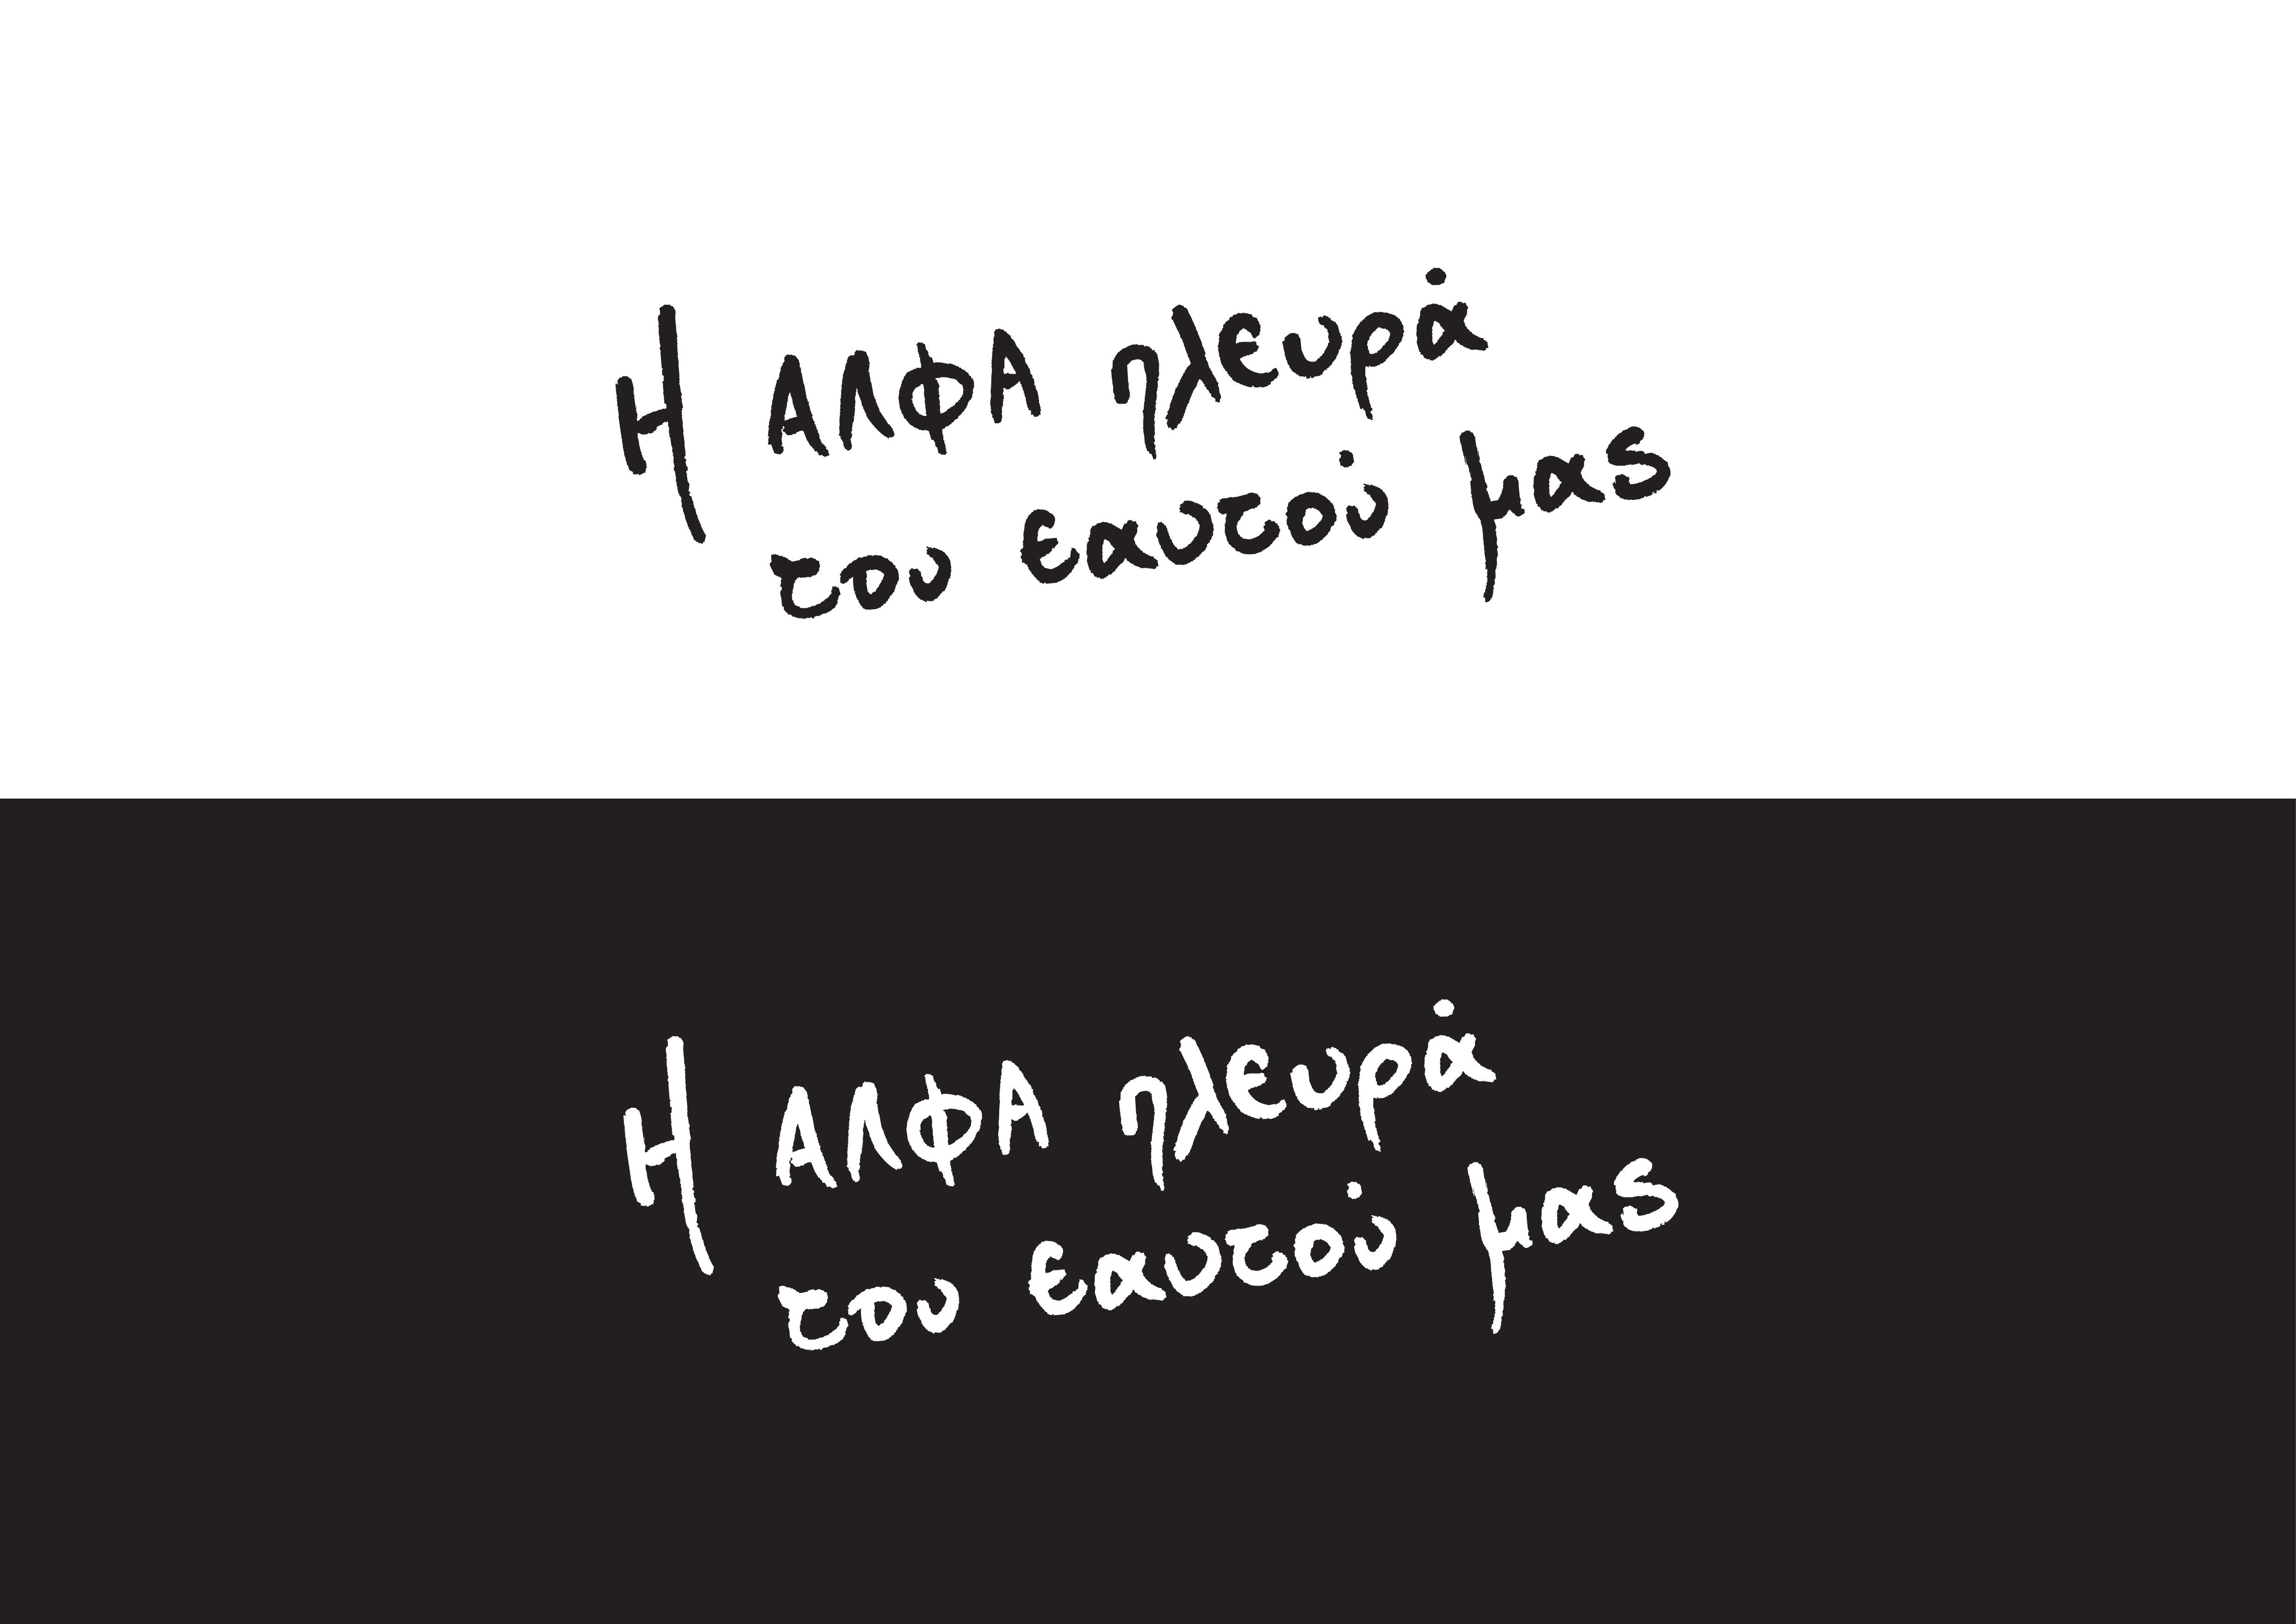 AlfaPlevra